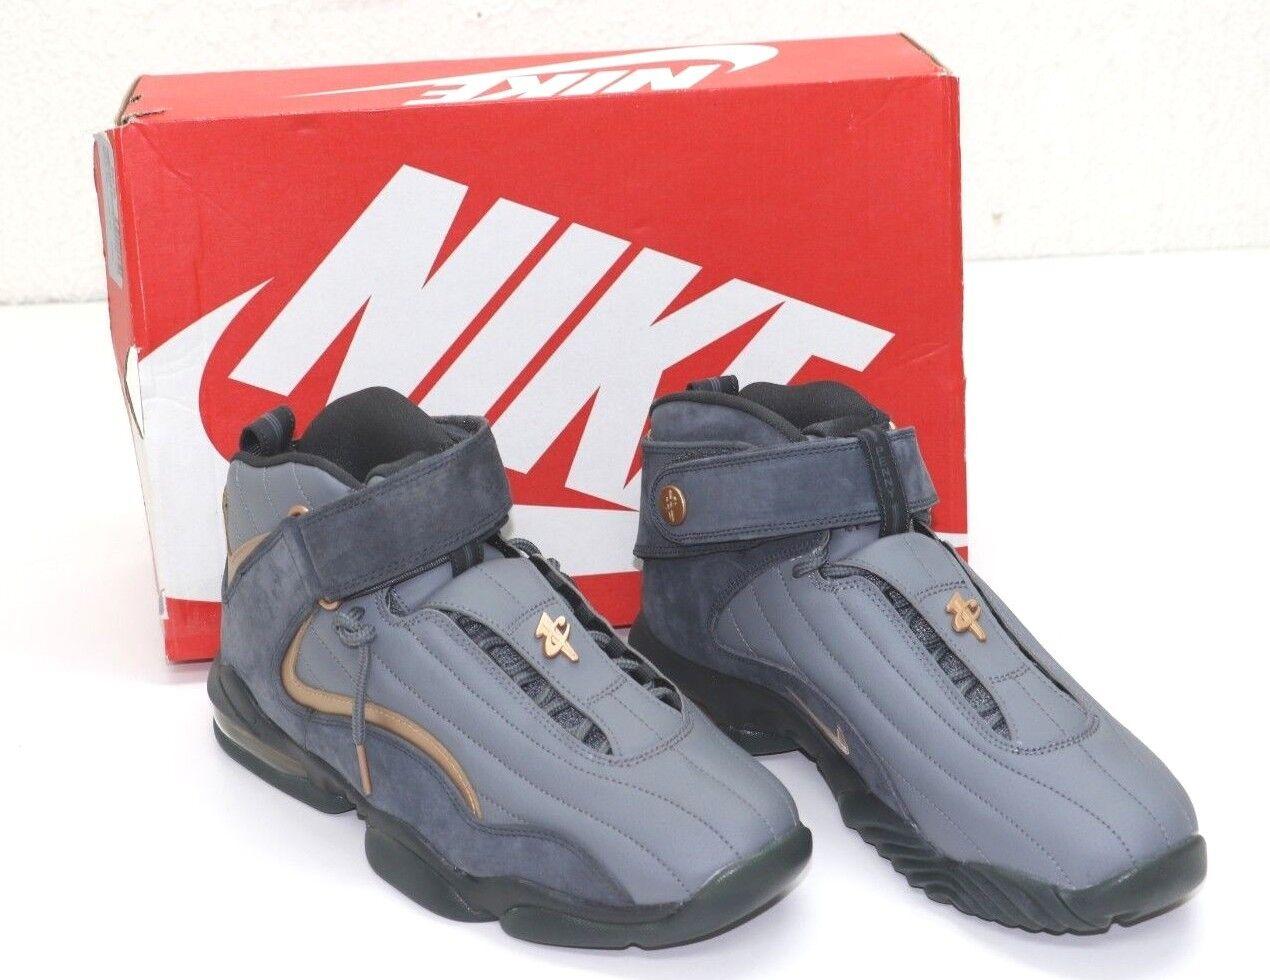 Nike air penny 4 iv wolf grau coppercoin 864018-002 sz 9us - eur 42,5